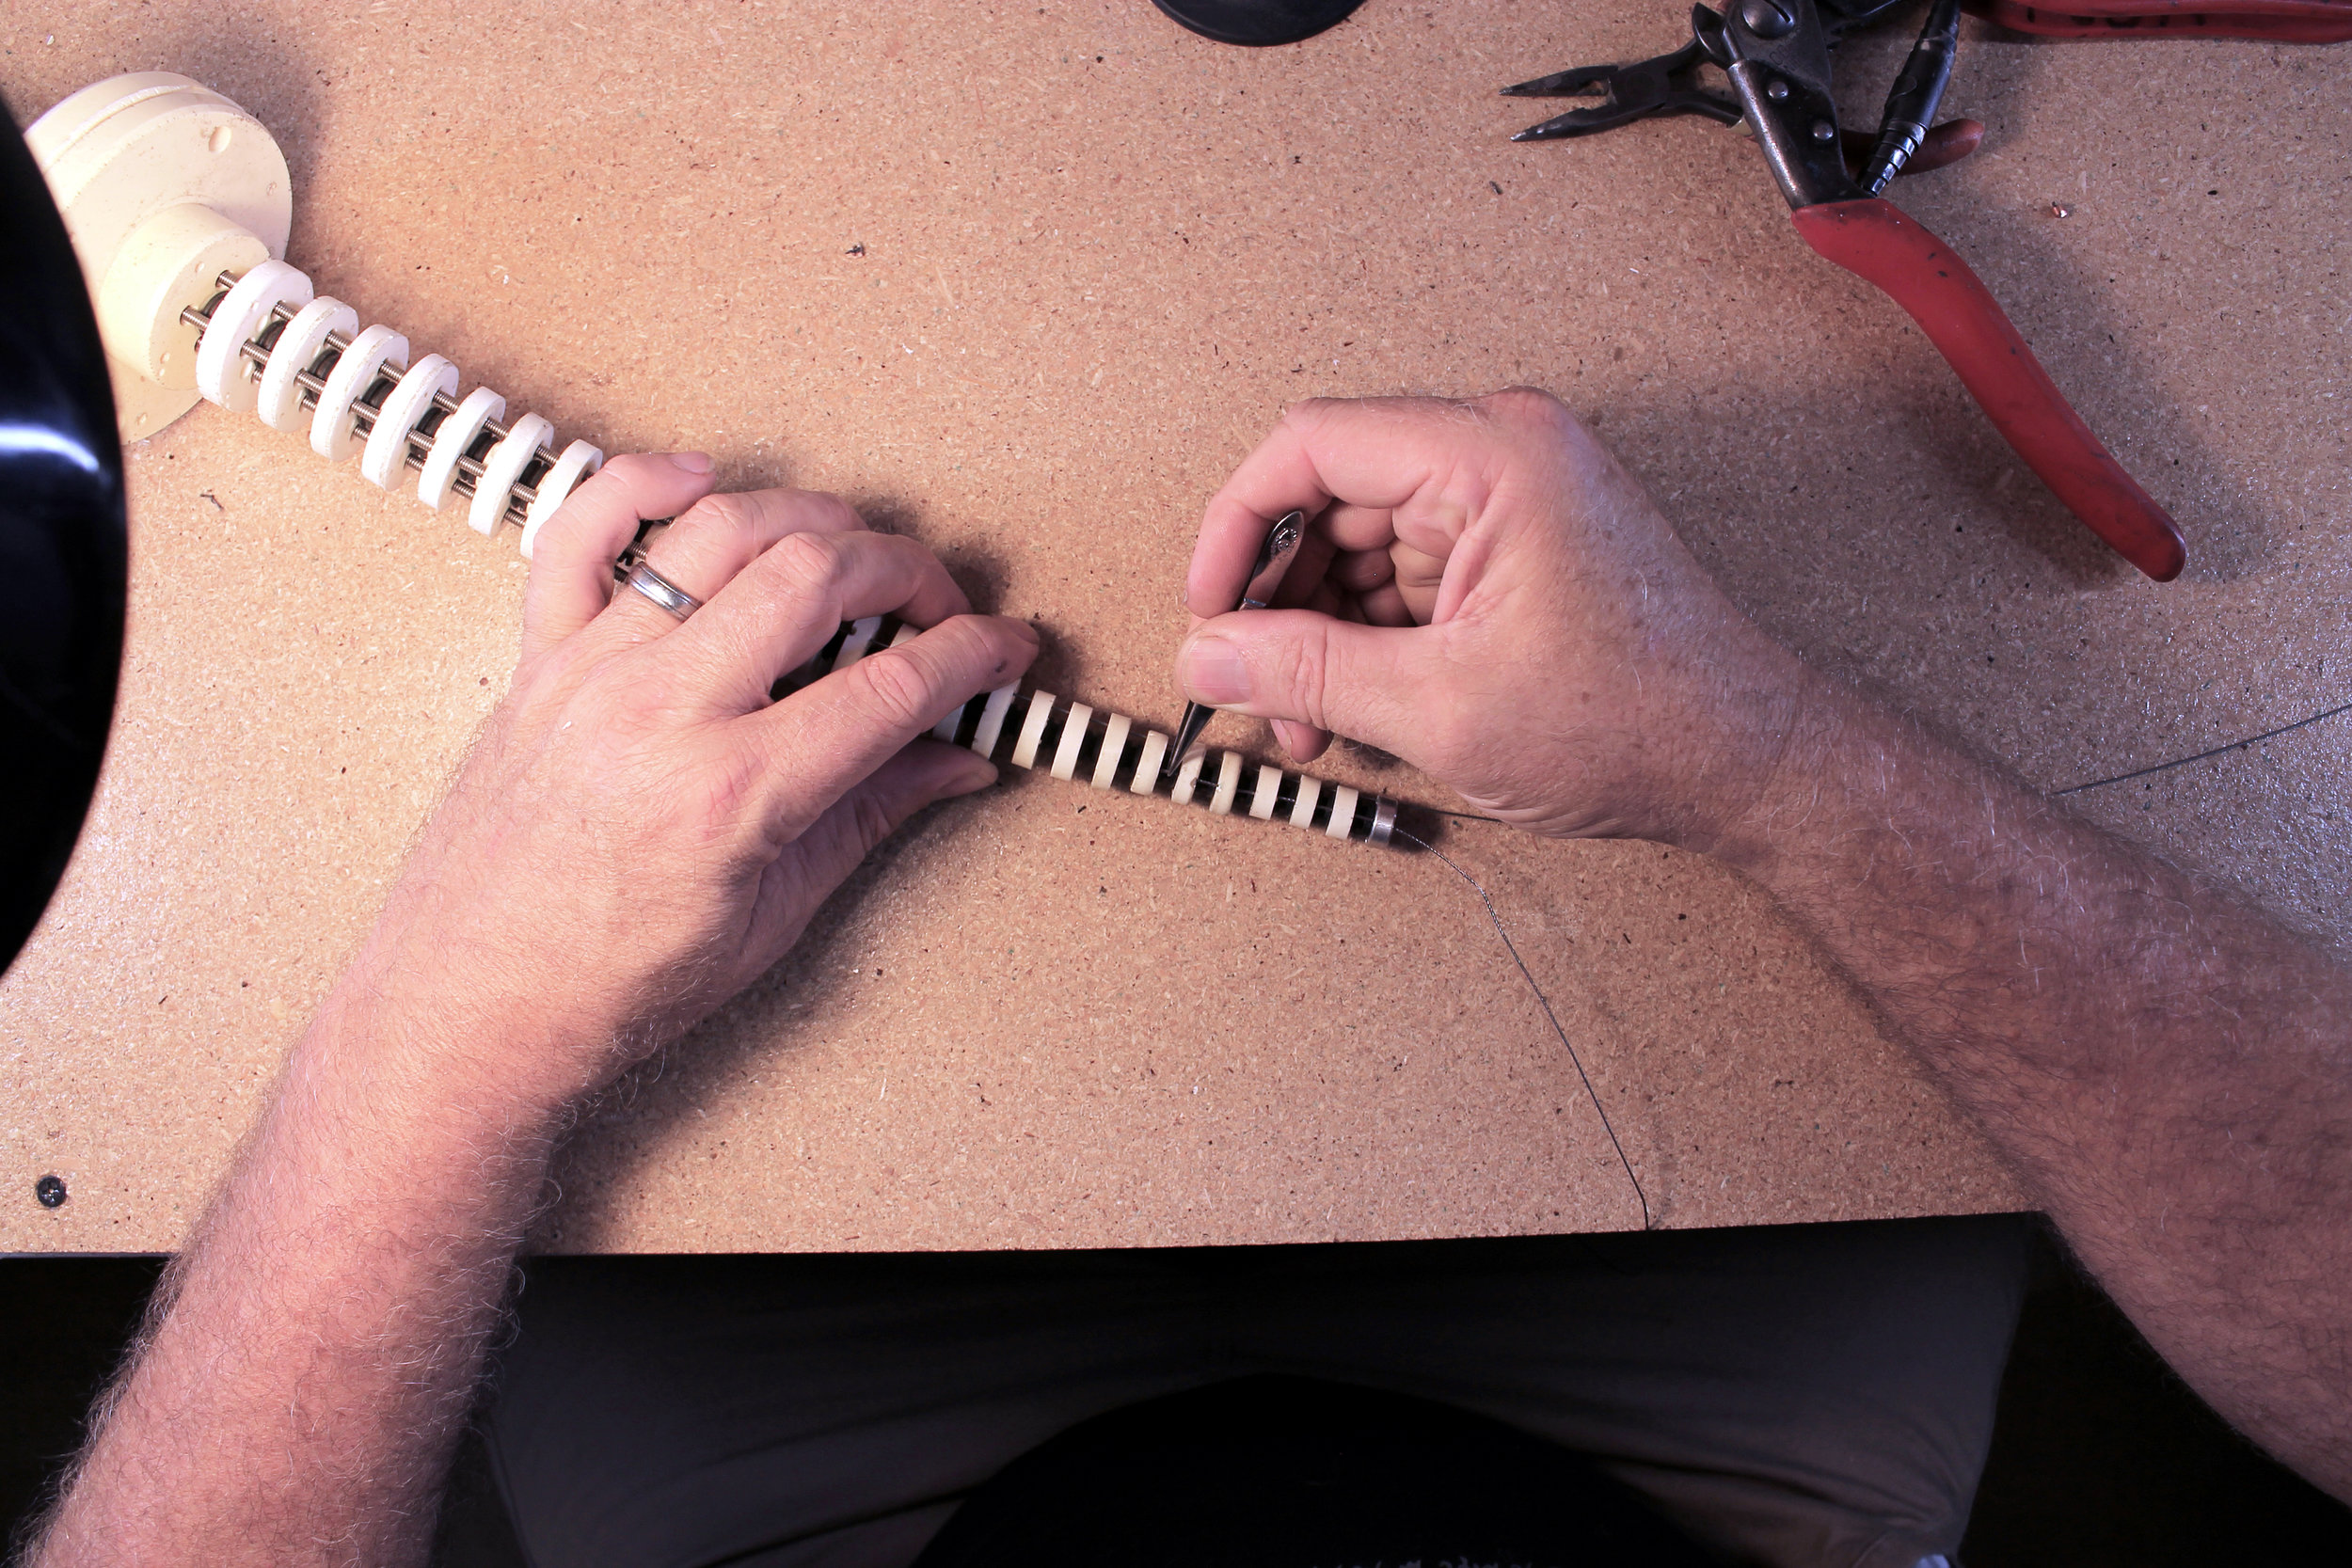 Tweezers = tiny fingers